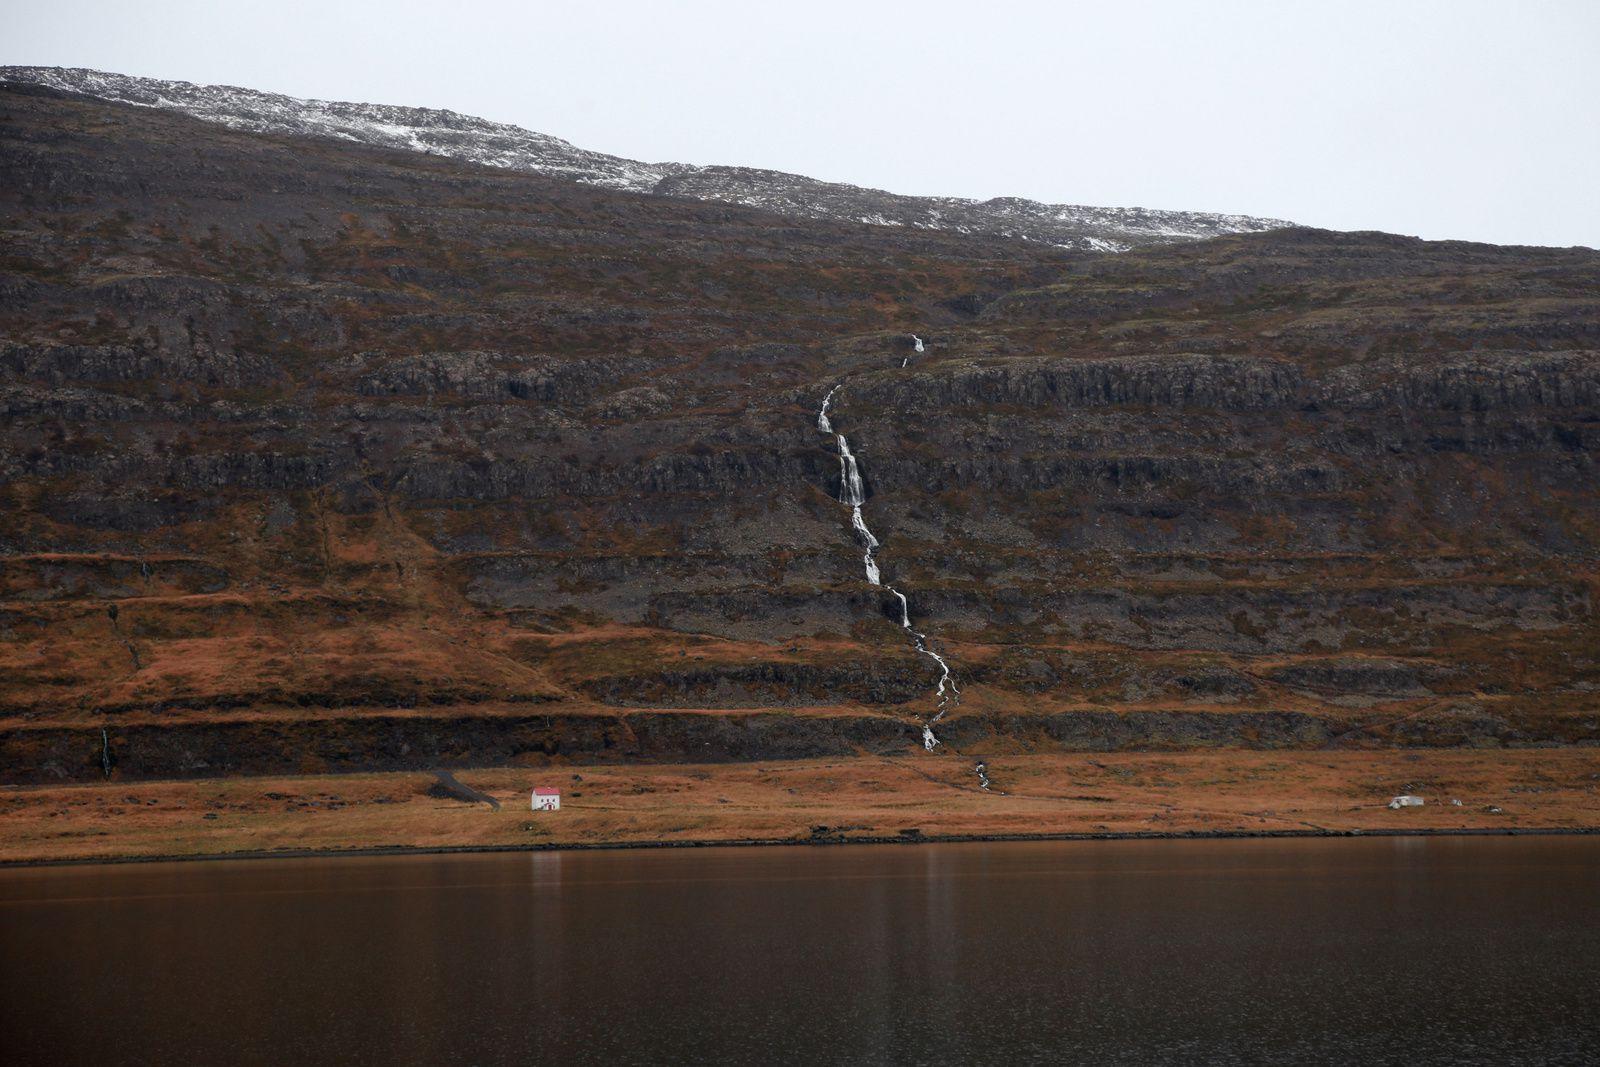 Ísafjarðardjúp - trapps basaltiques - la maison donne l'échelle - photo © Bernard Duyck 10.2016